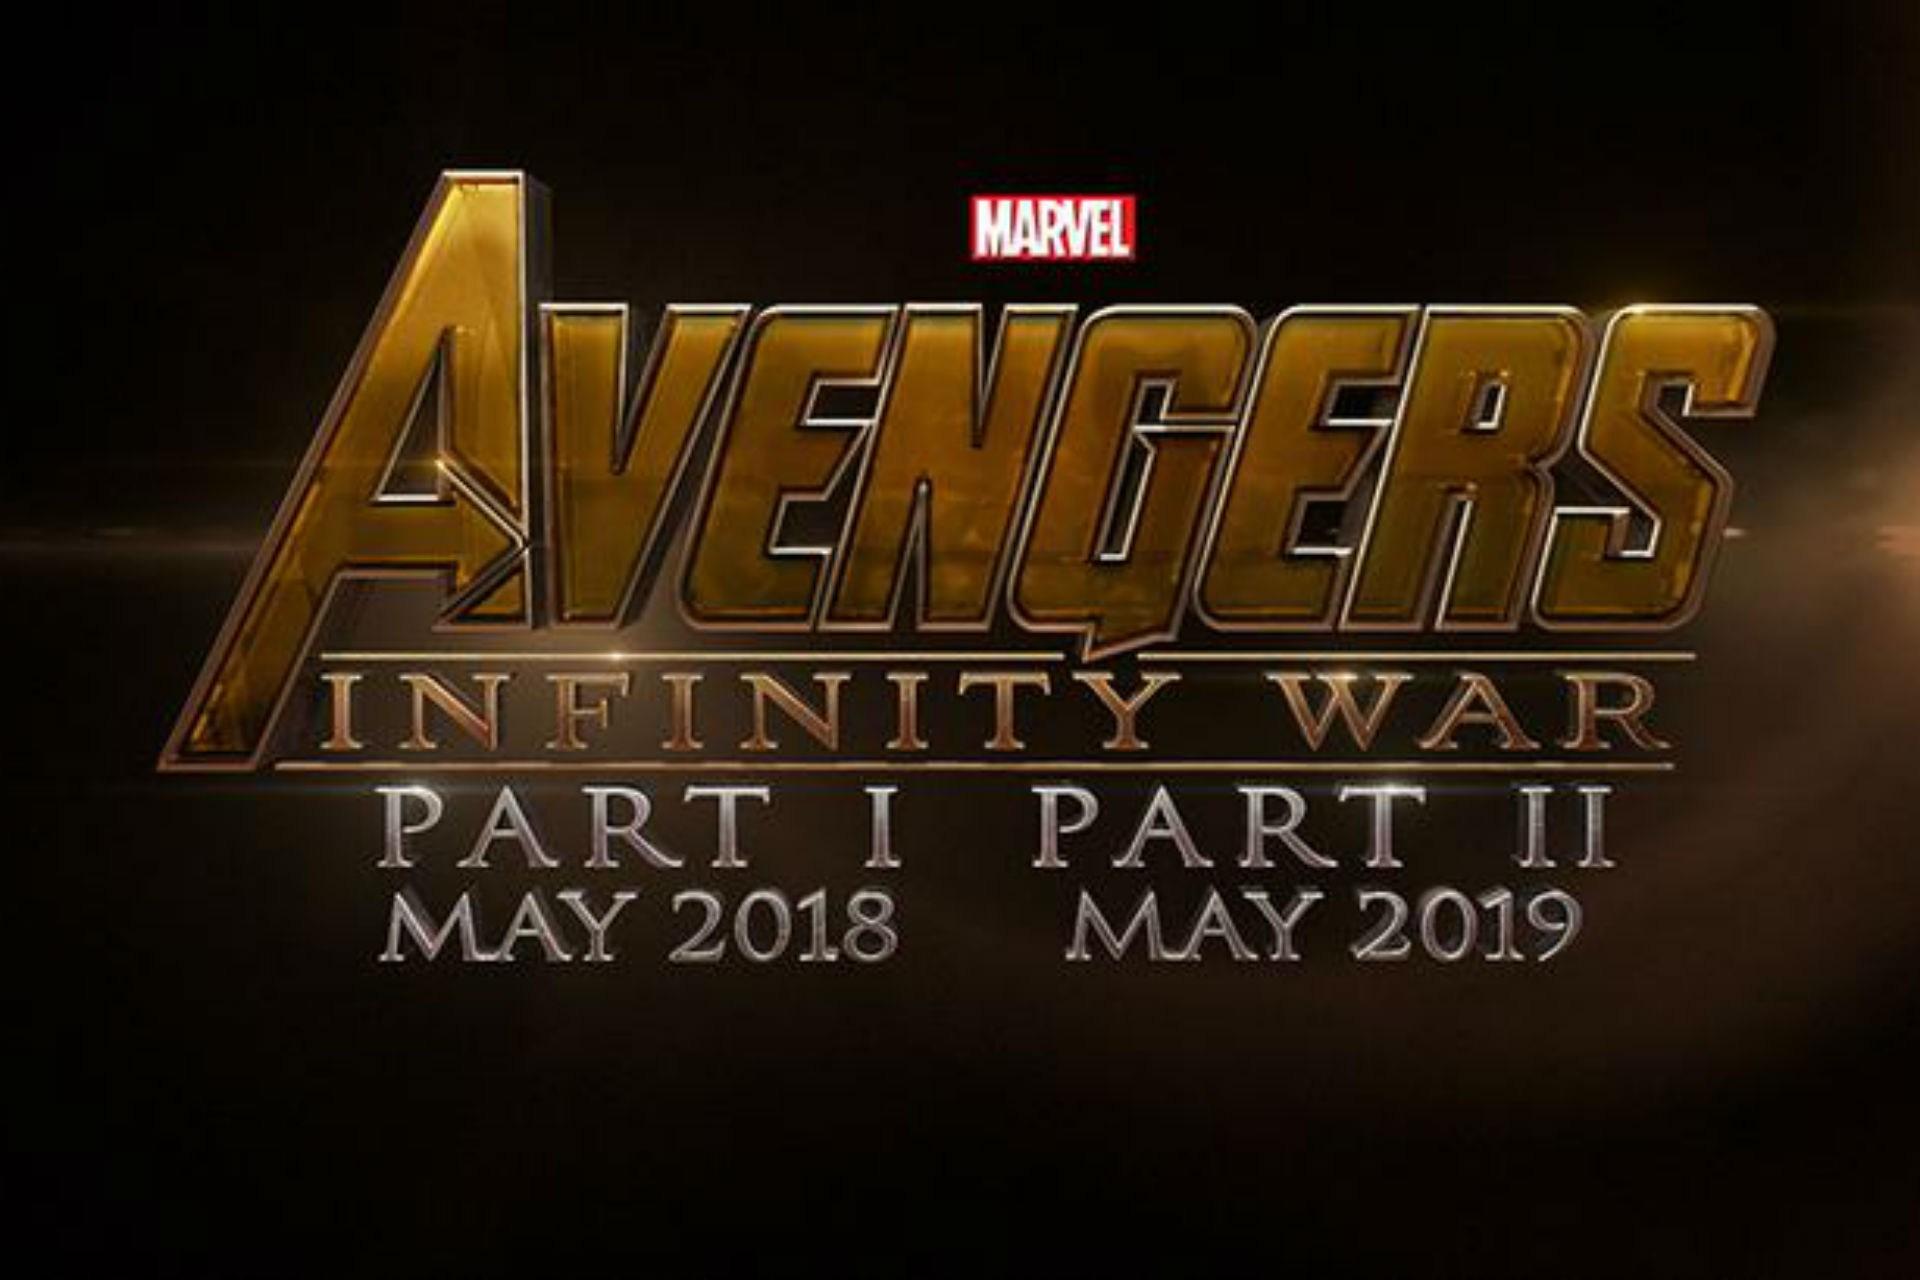 affiche du film Avengers: Infinity War (Part 2)